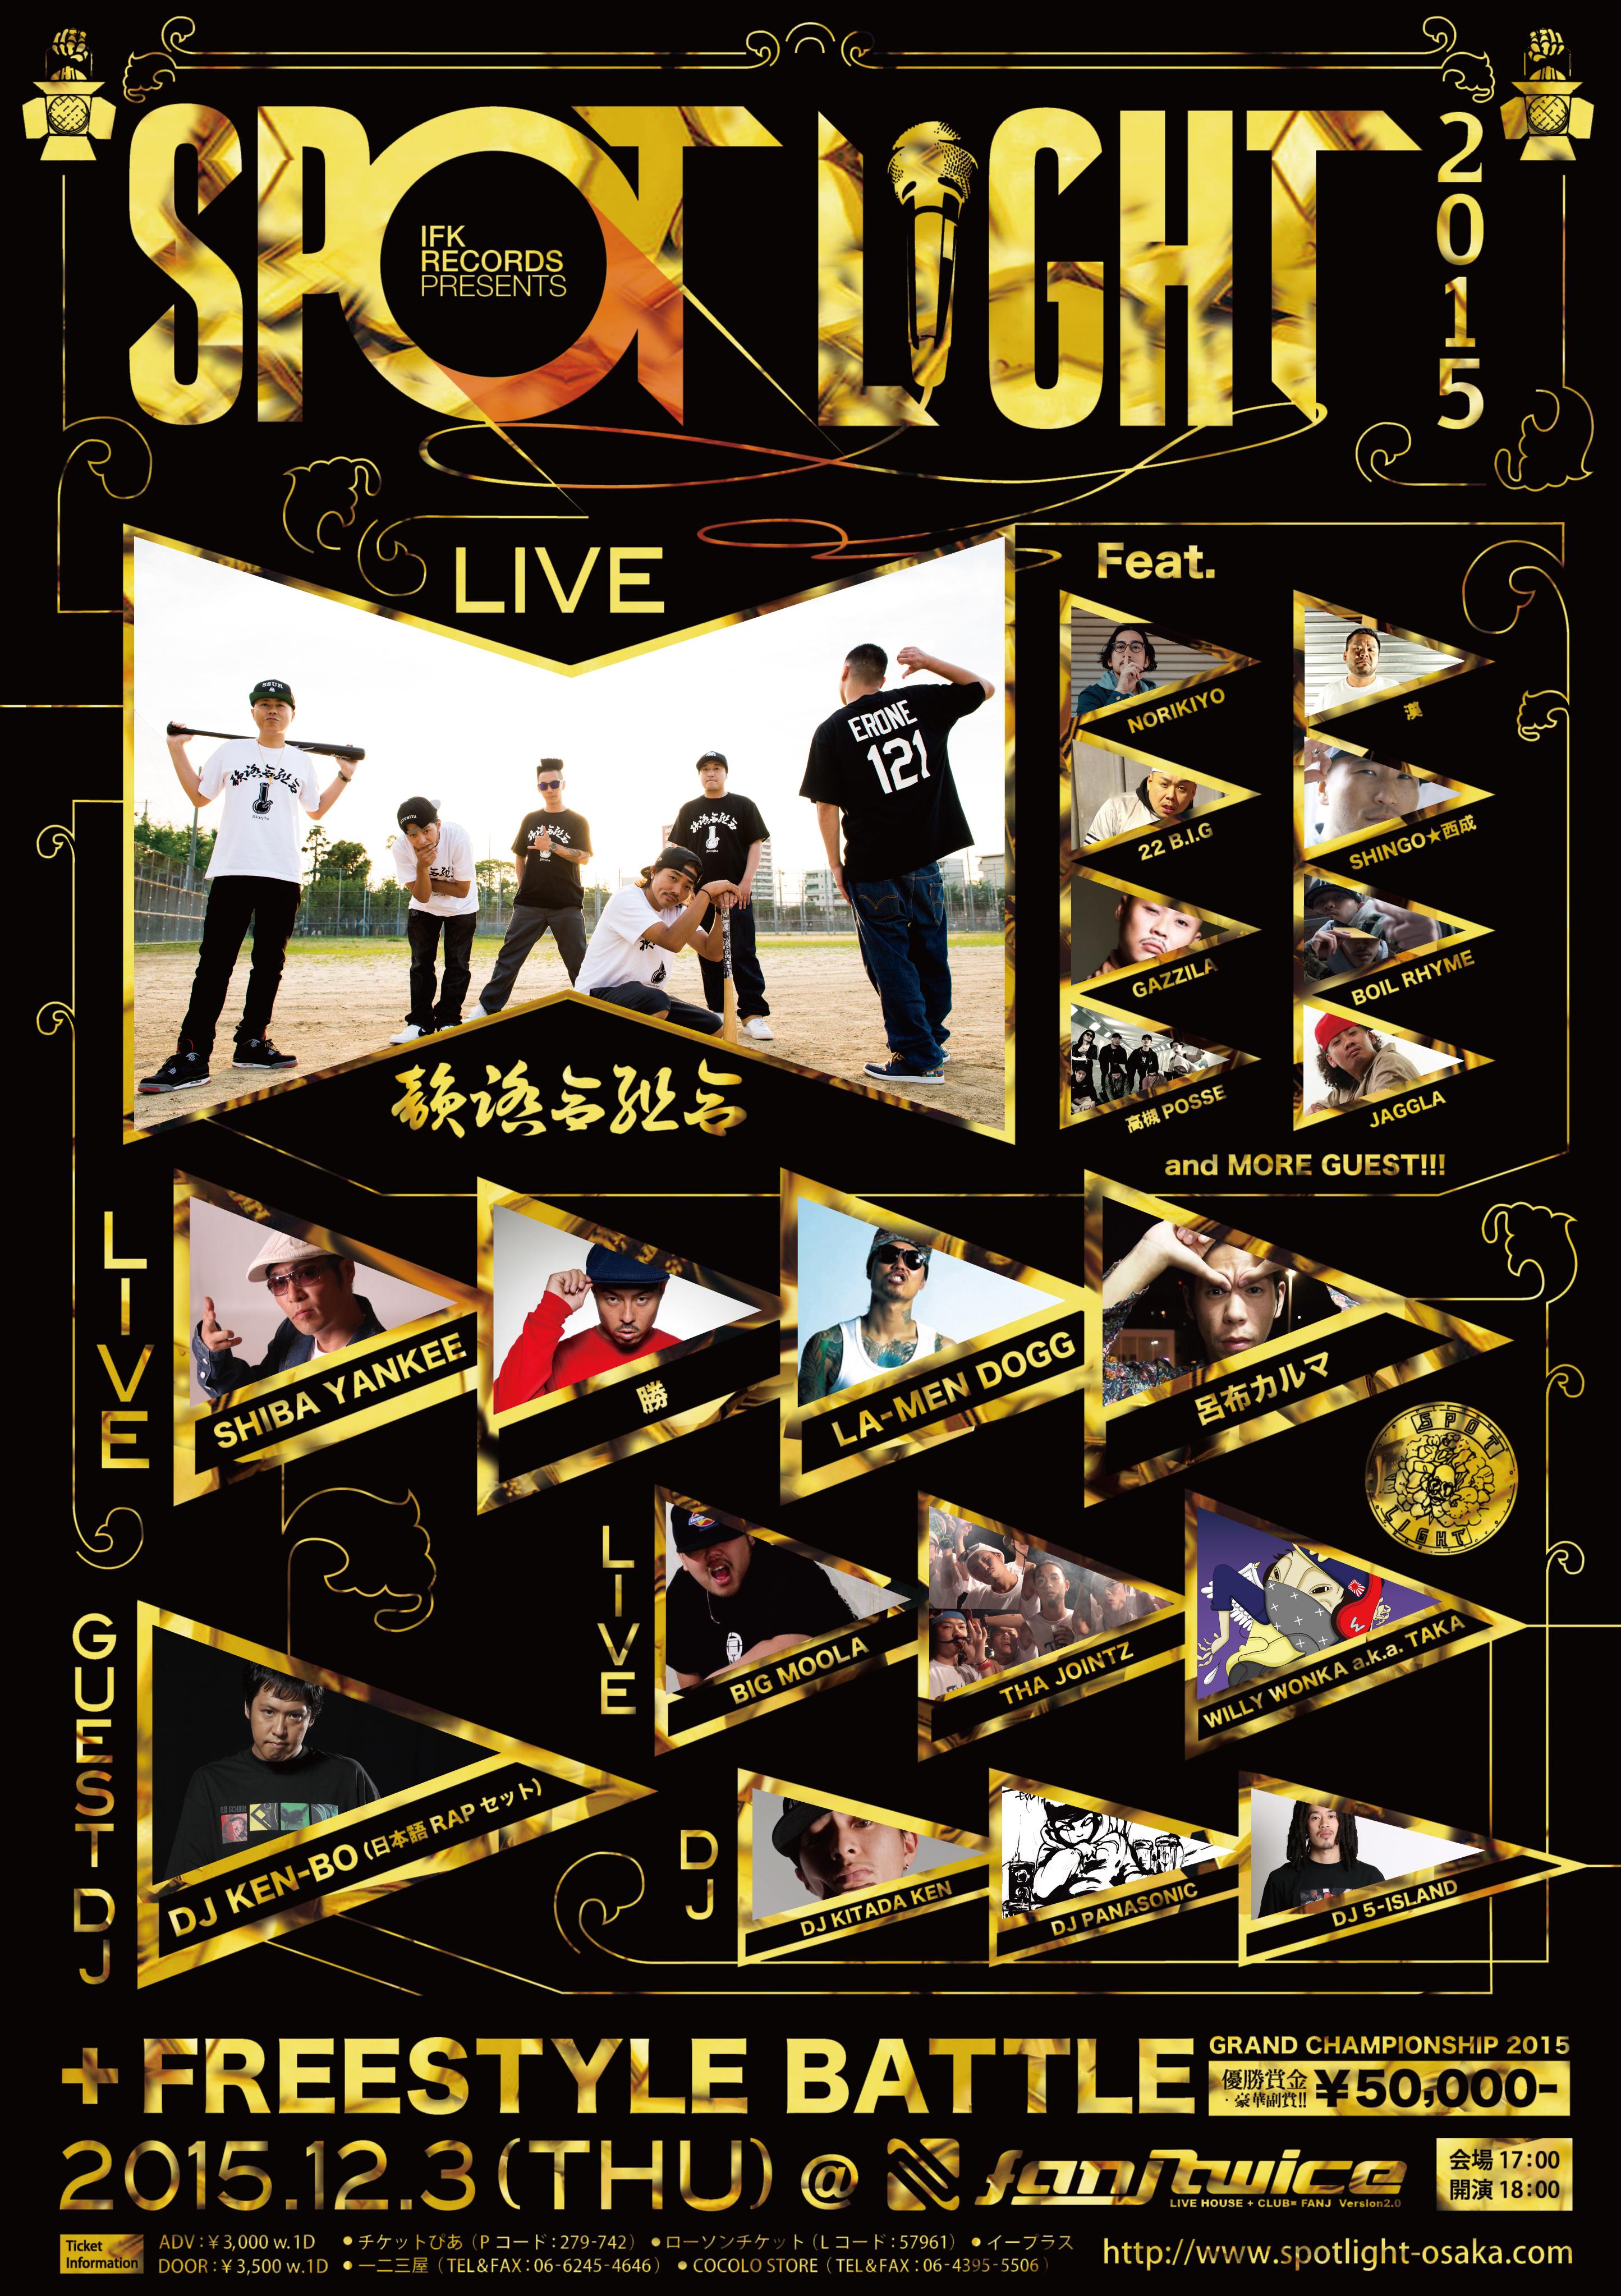 SPOT LIGHT LIVE_3_A4たて_表面 [更新済み].jpg